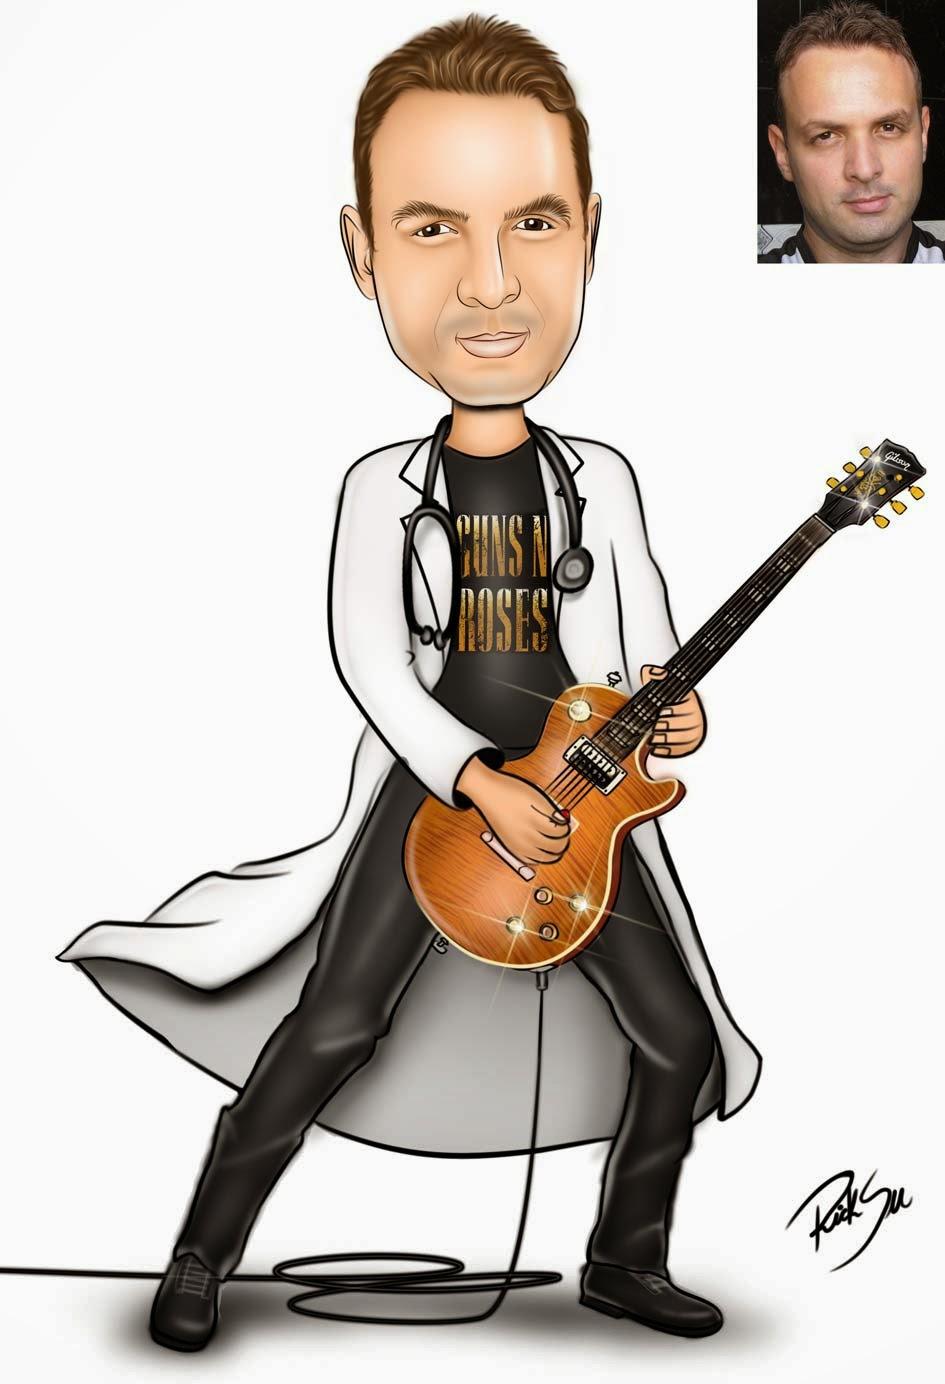 Medicina desenho de guitarrista guns´n roses